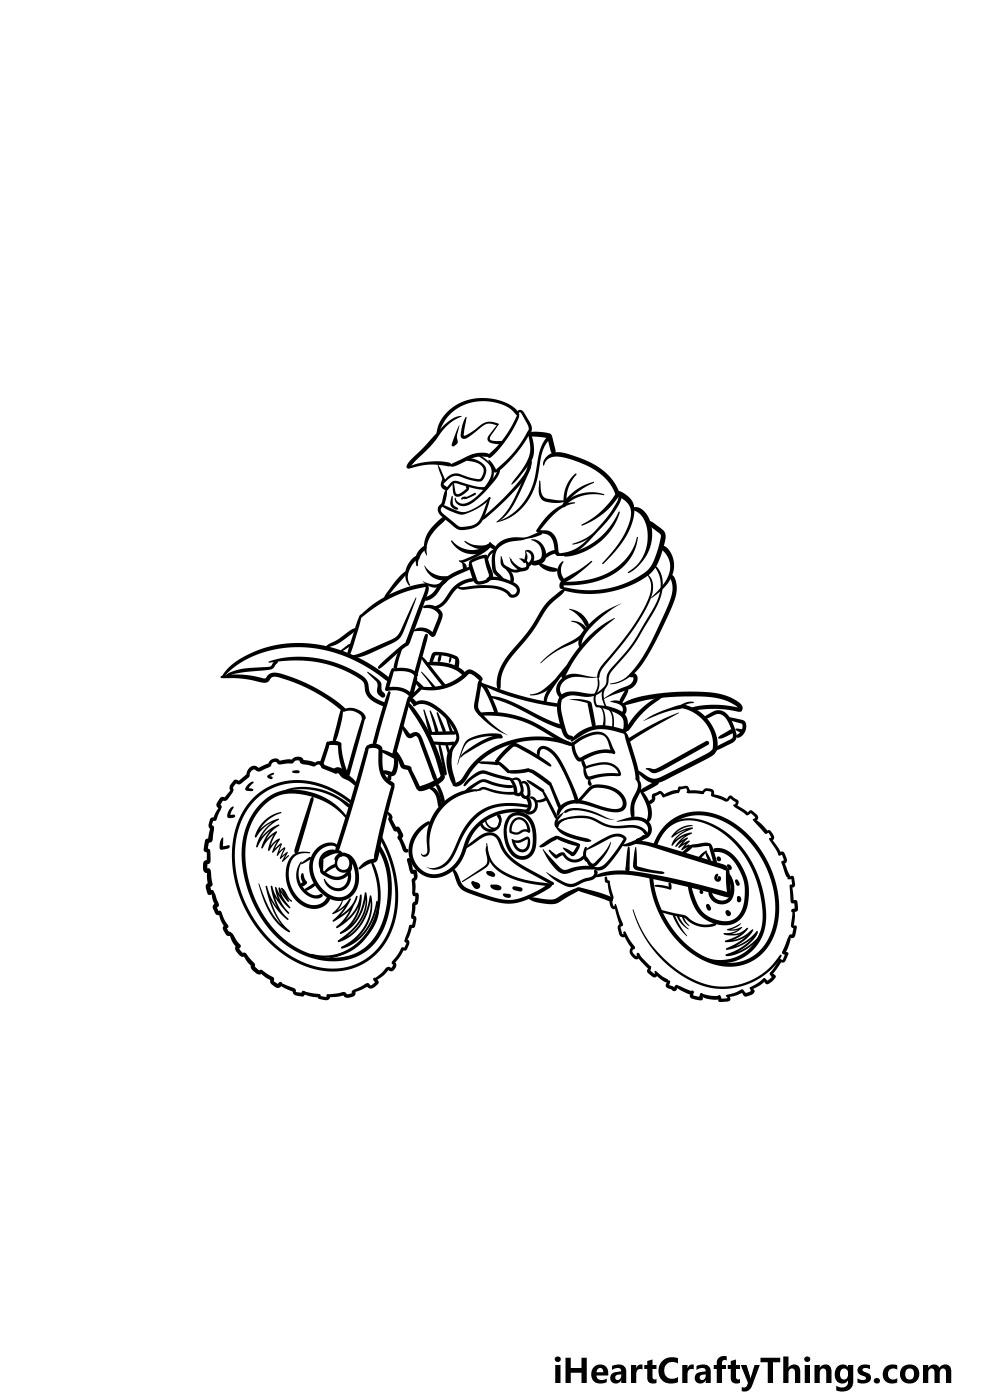 drawing a dirt bike step 5